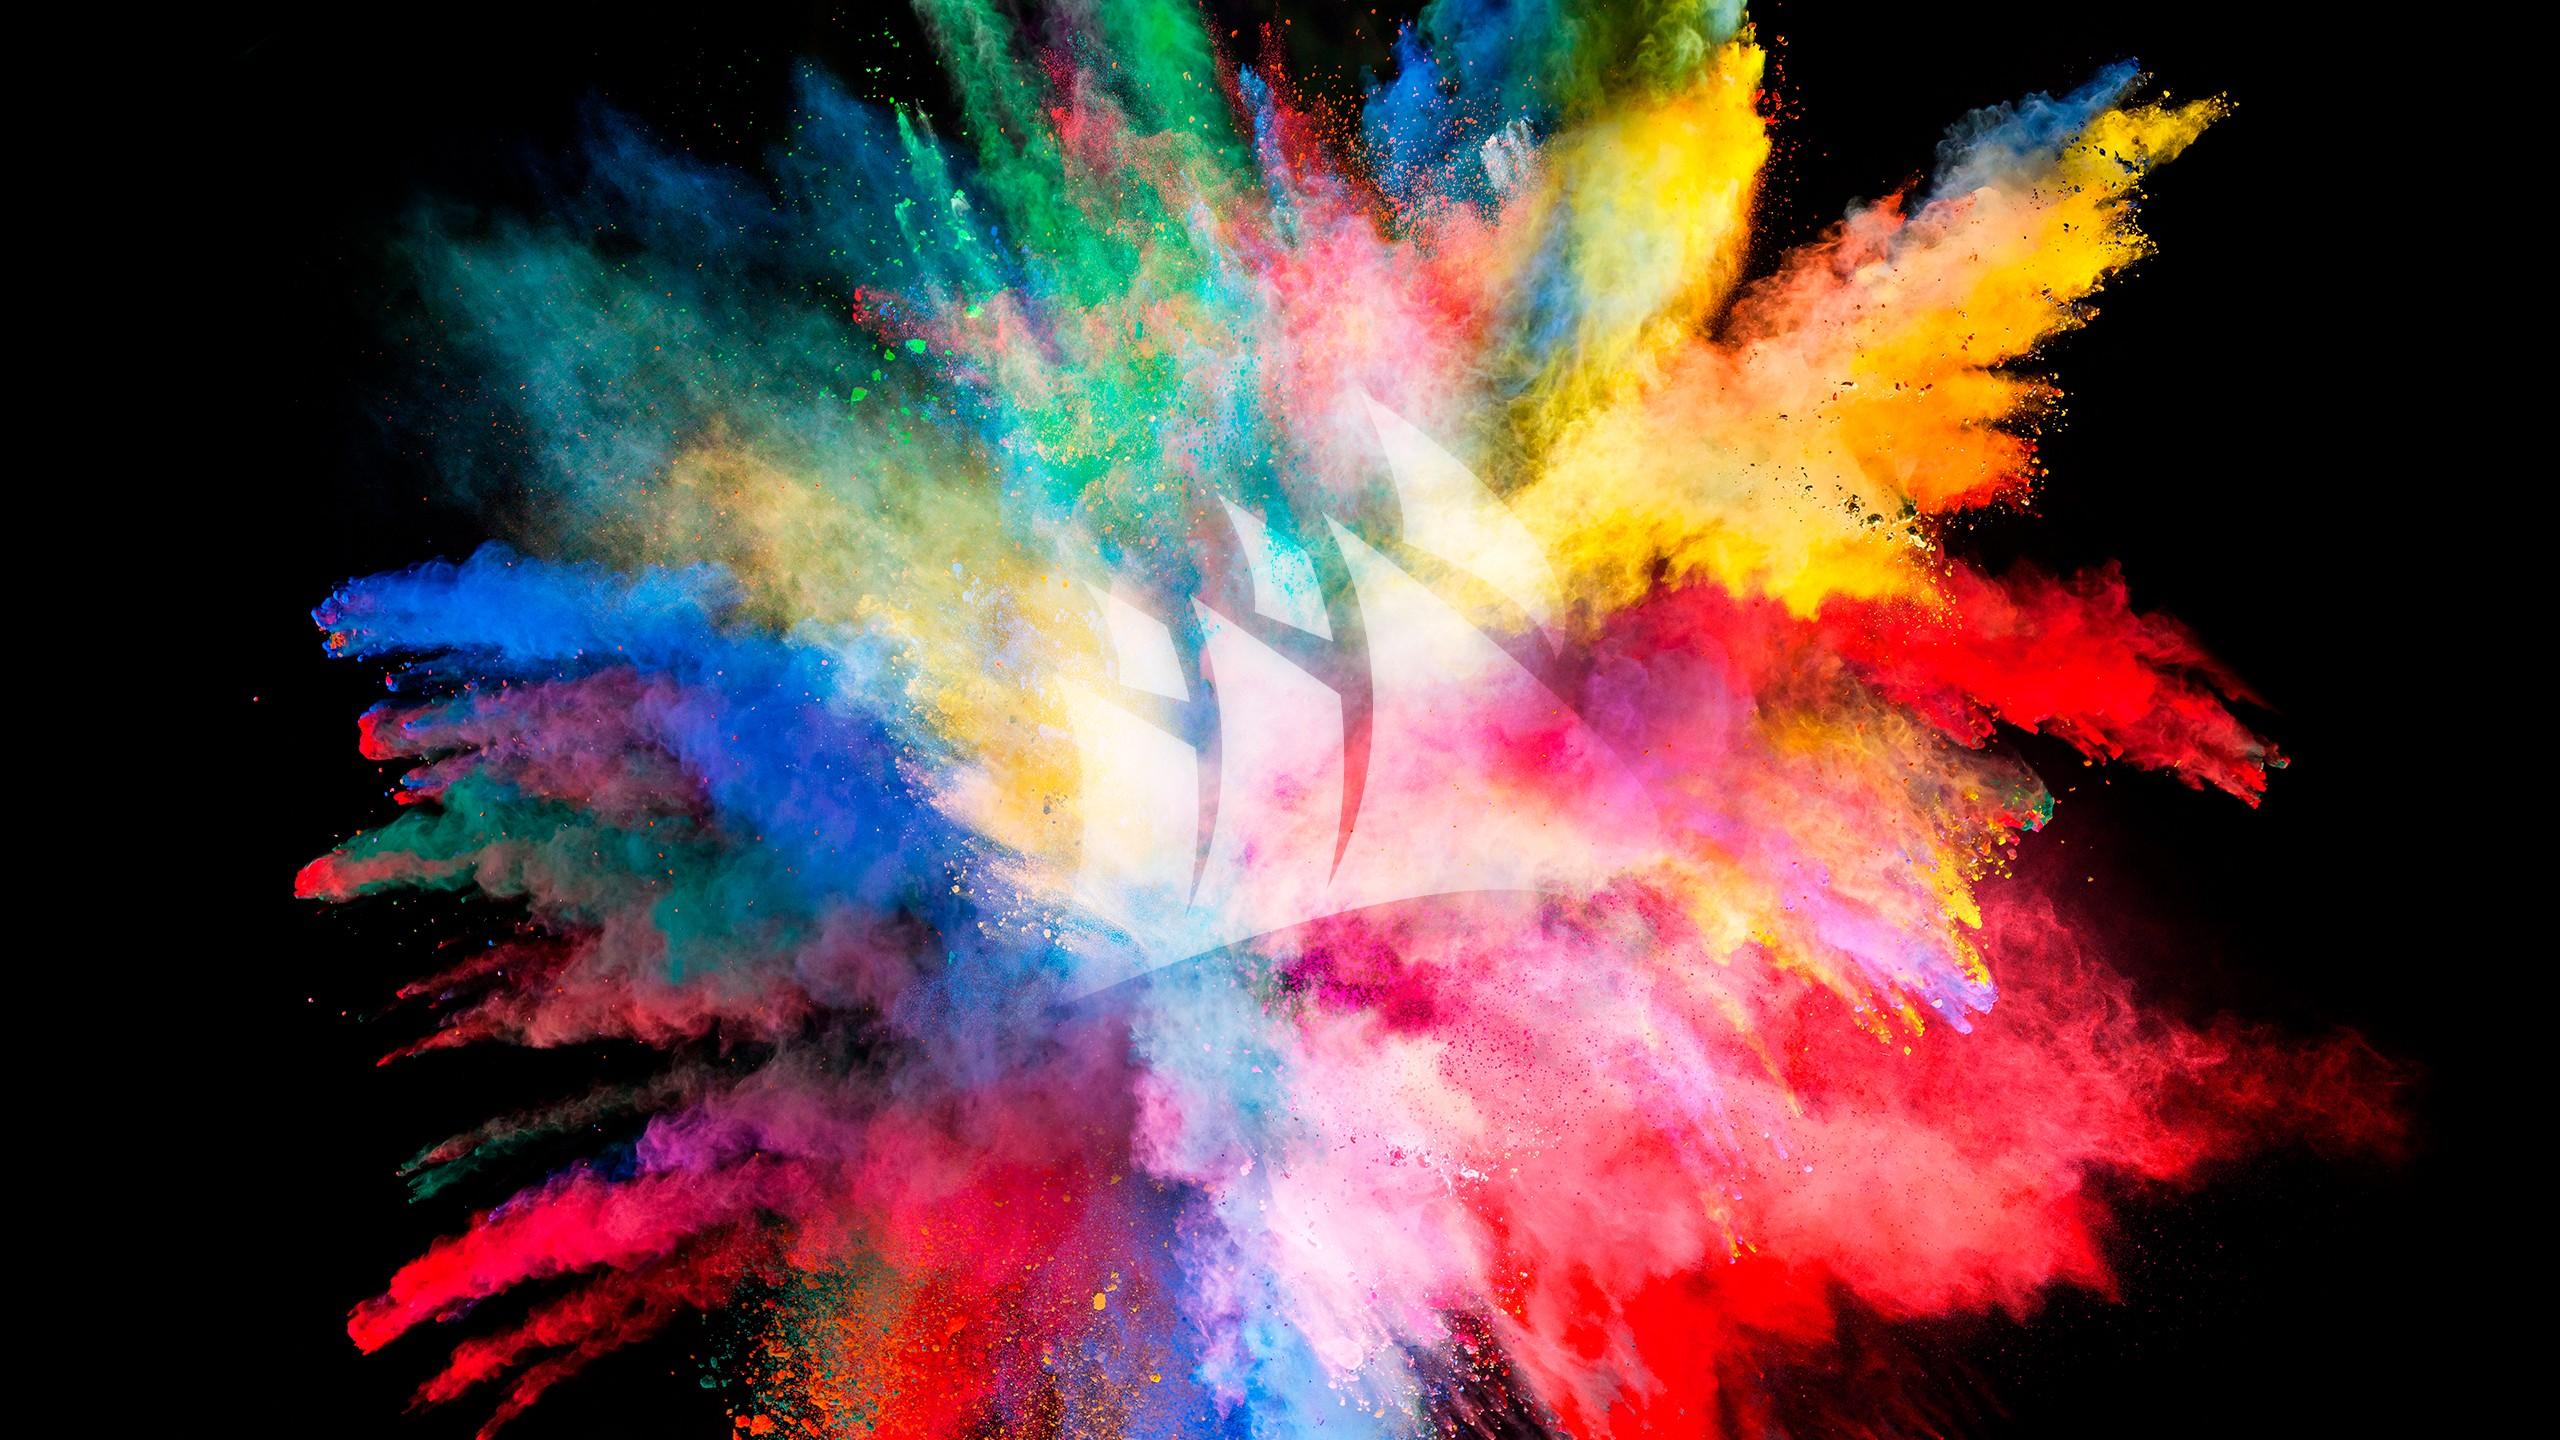 Color Burst Wallpaper 2560x1440